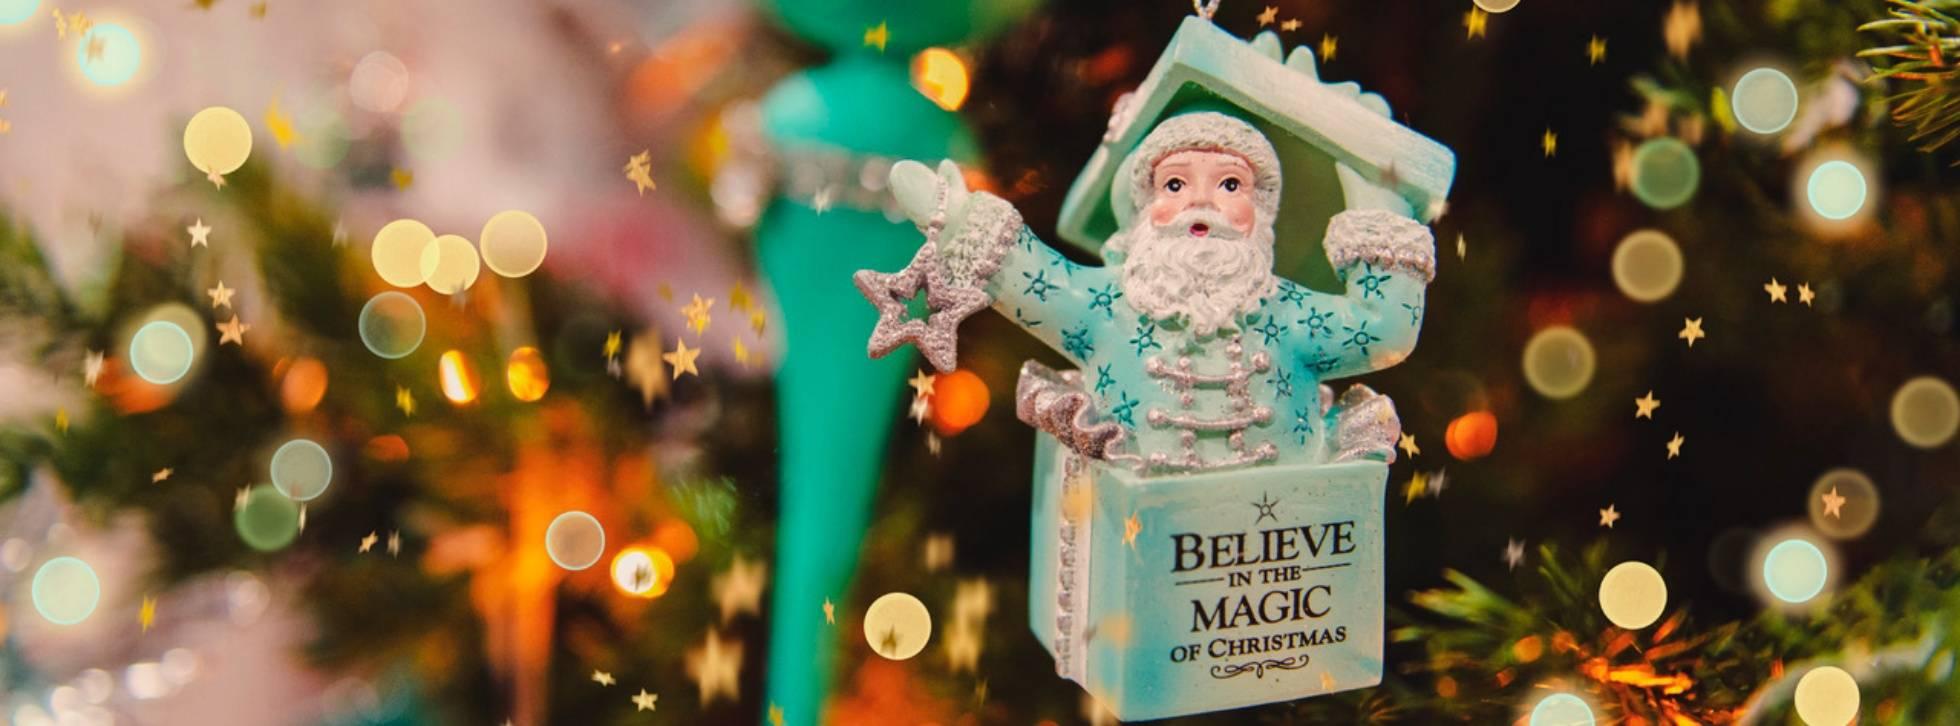 Sparkly Christmas at Tiaro Christmas Cottage